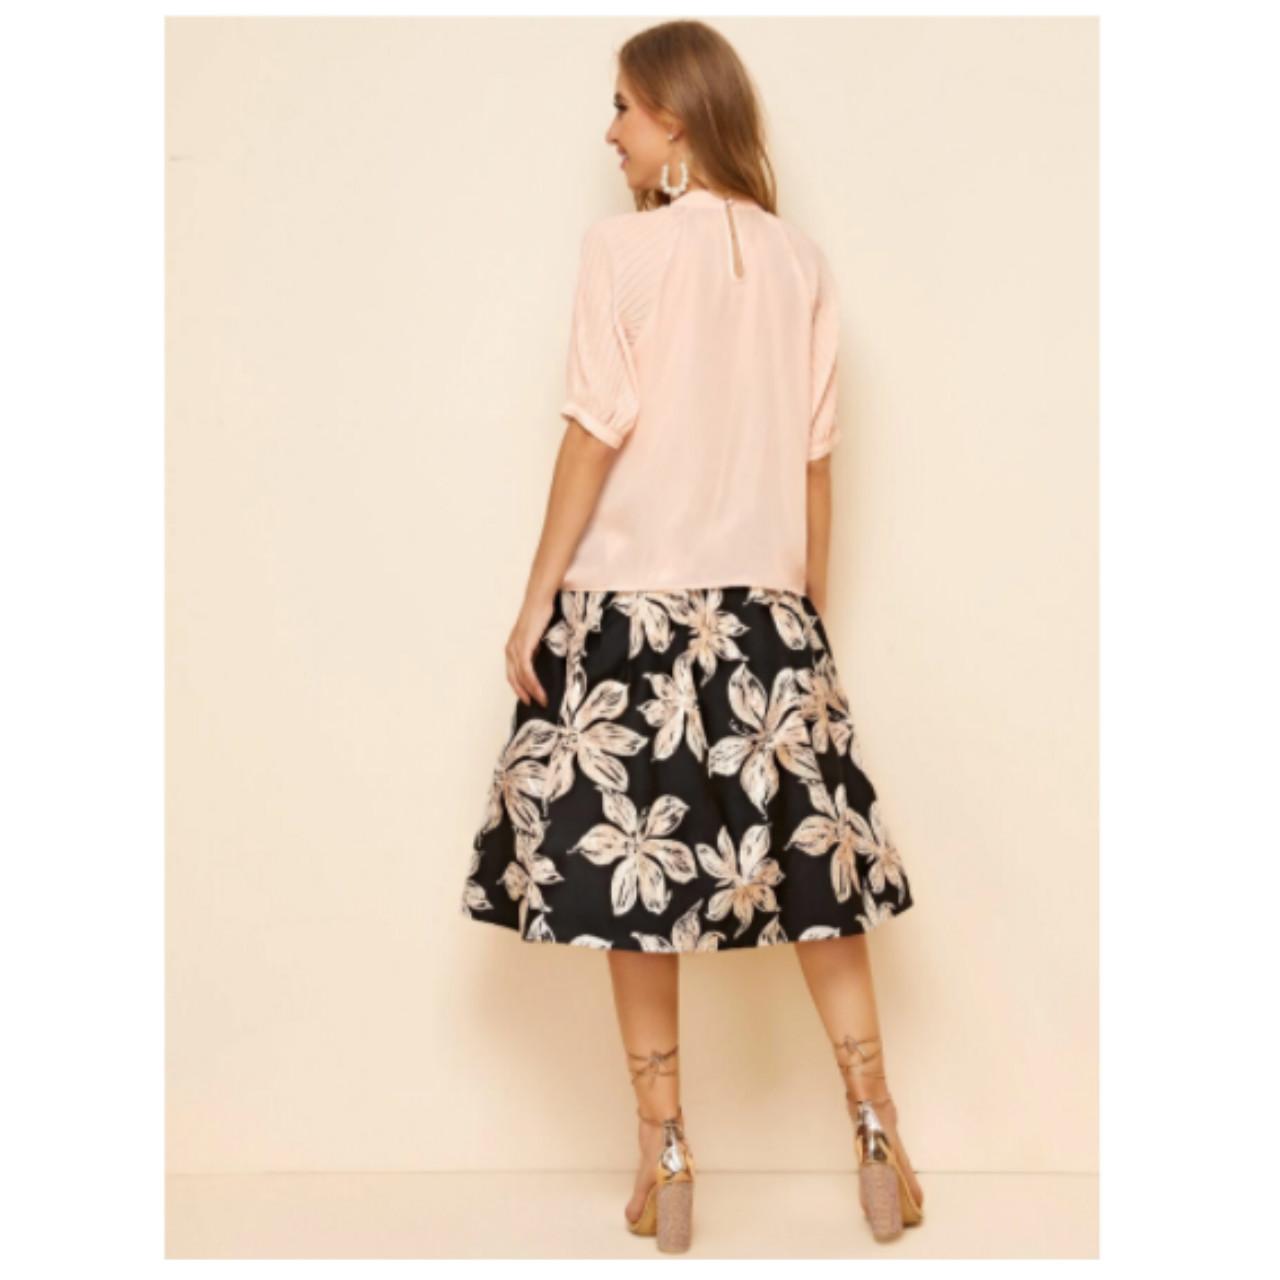 Shein raglan sleeve pearl brooch top and jacquard print skirt set m